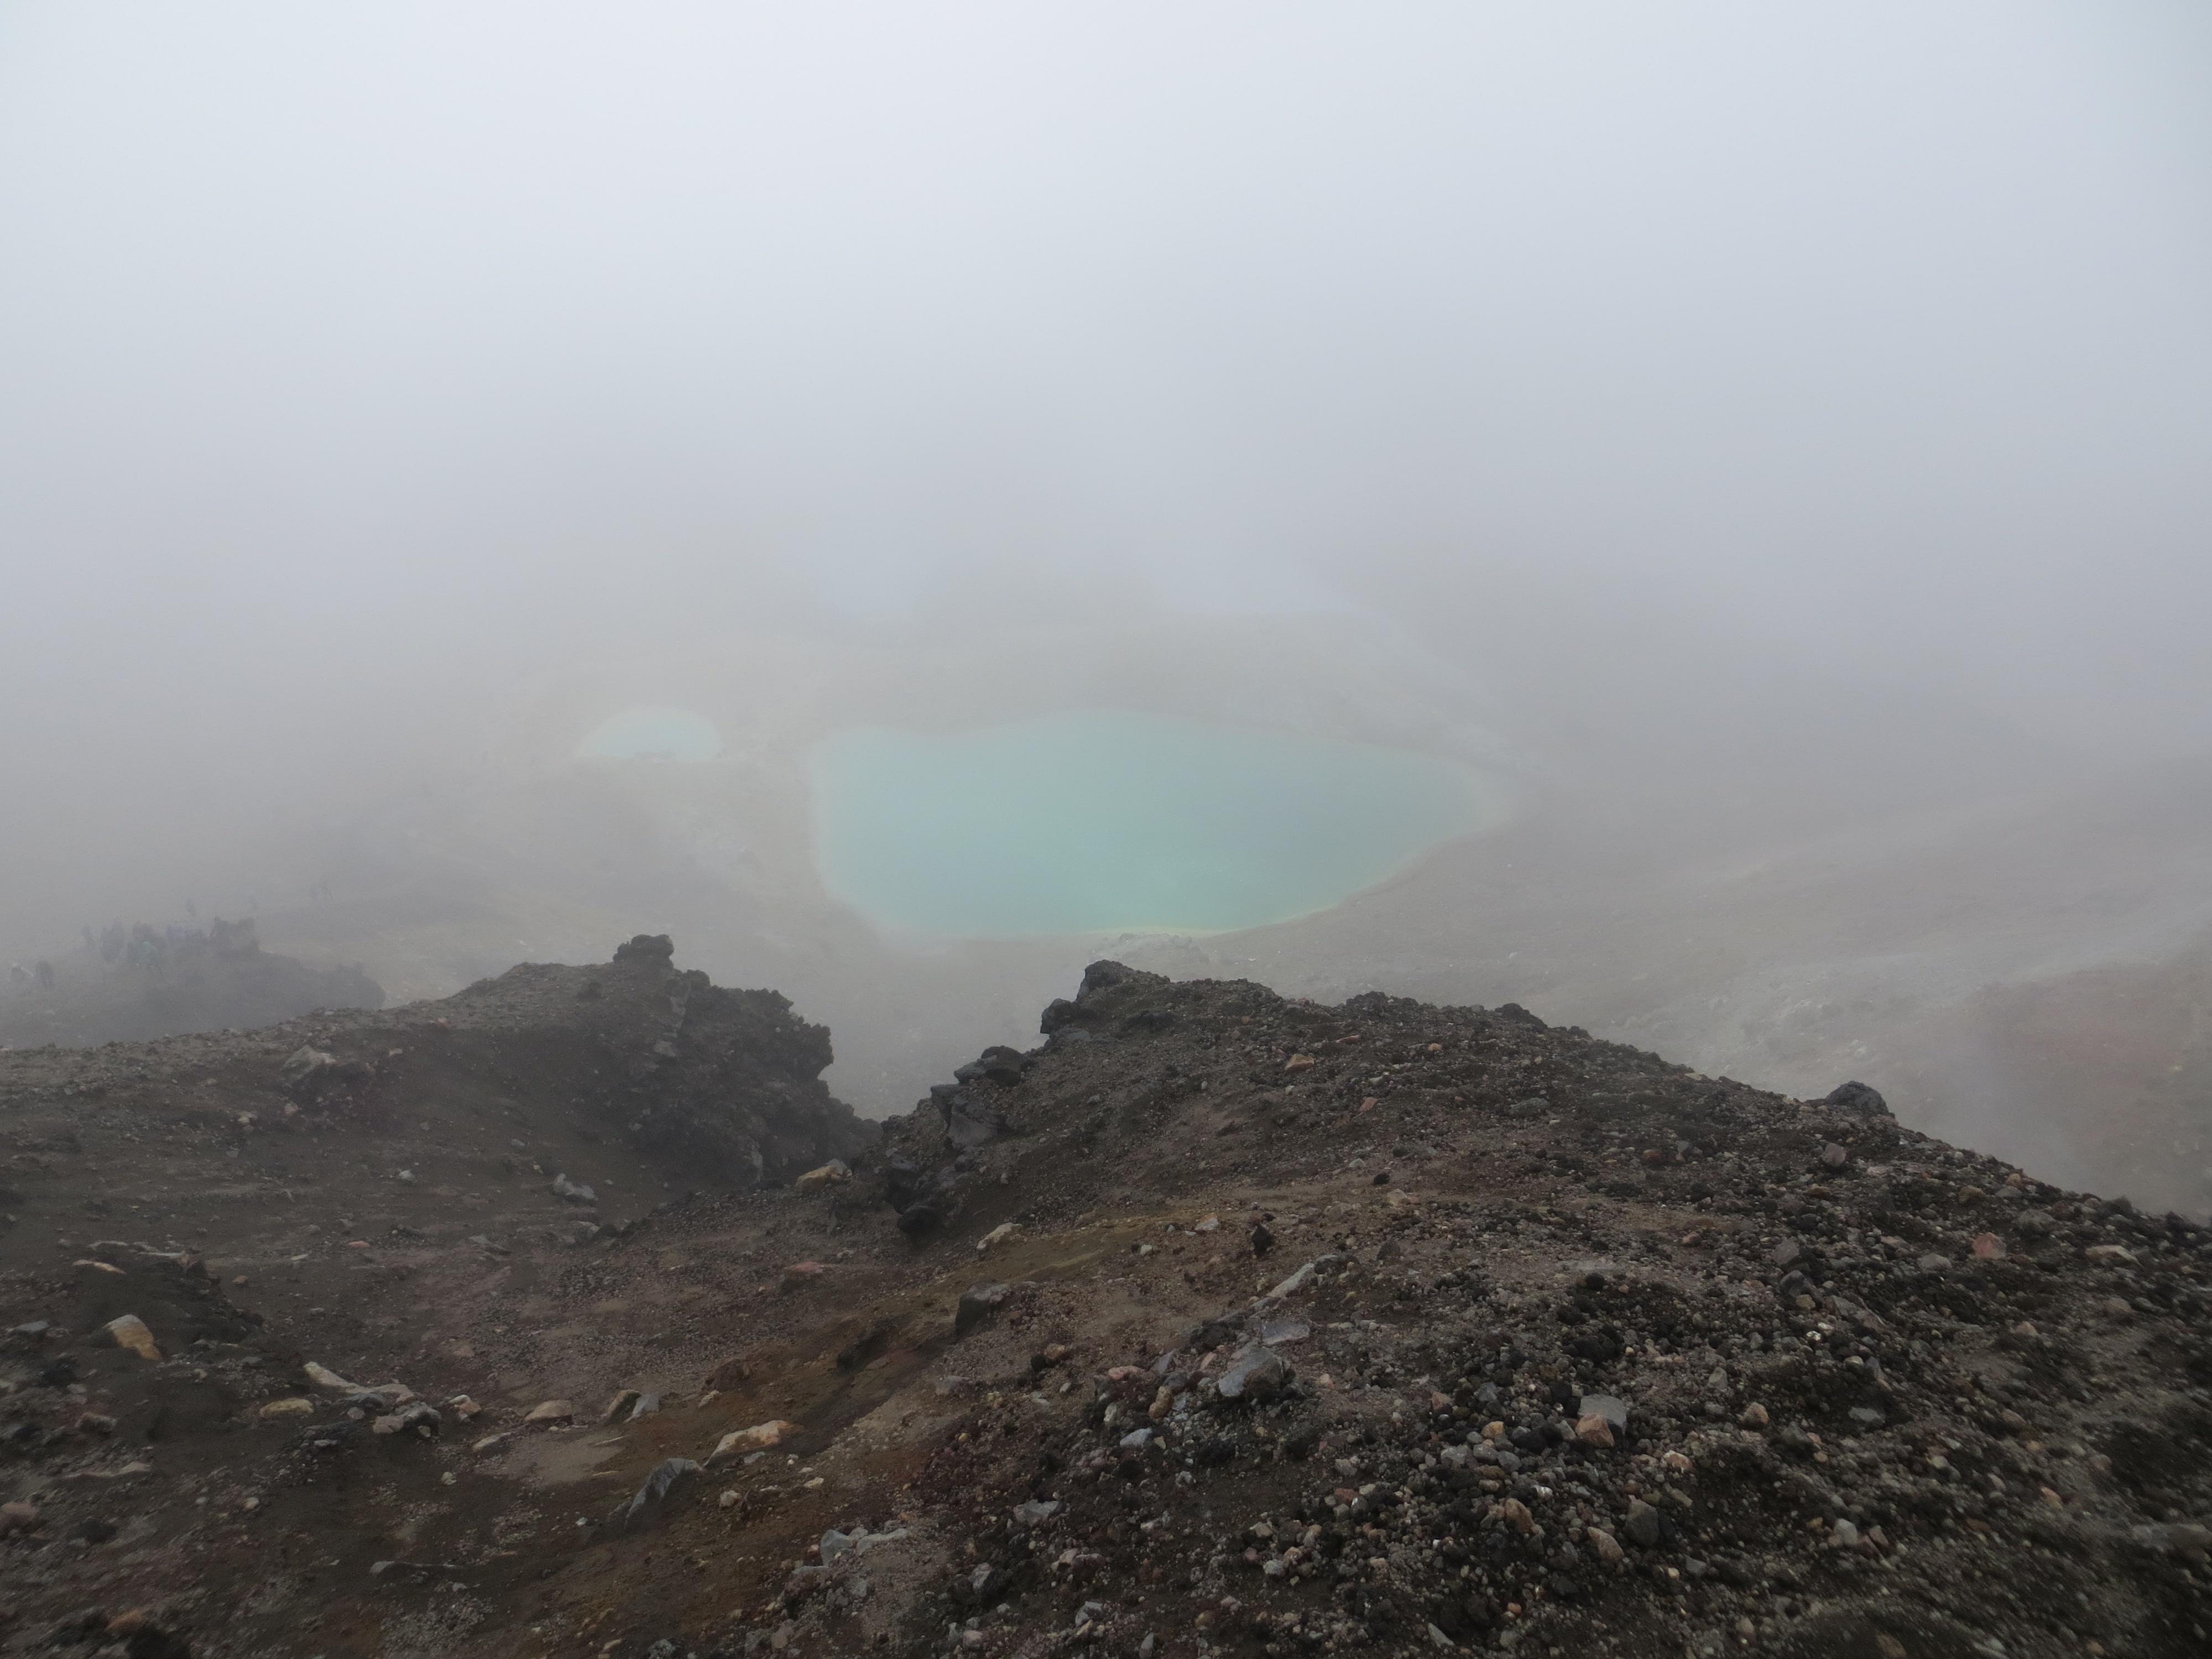 Tongariro hike best first glimpse of Emerald lake 2017-01-07 062